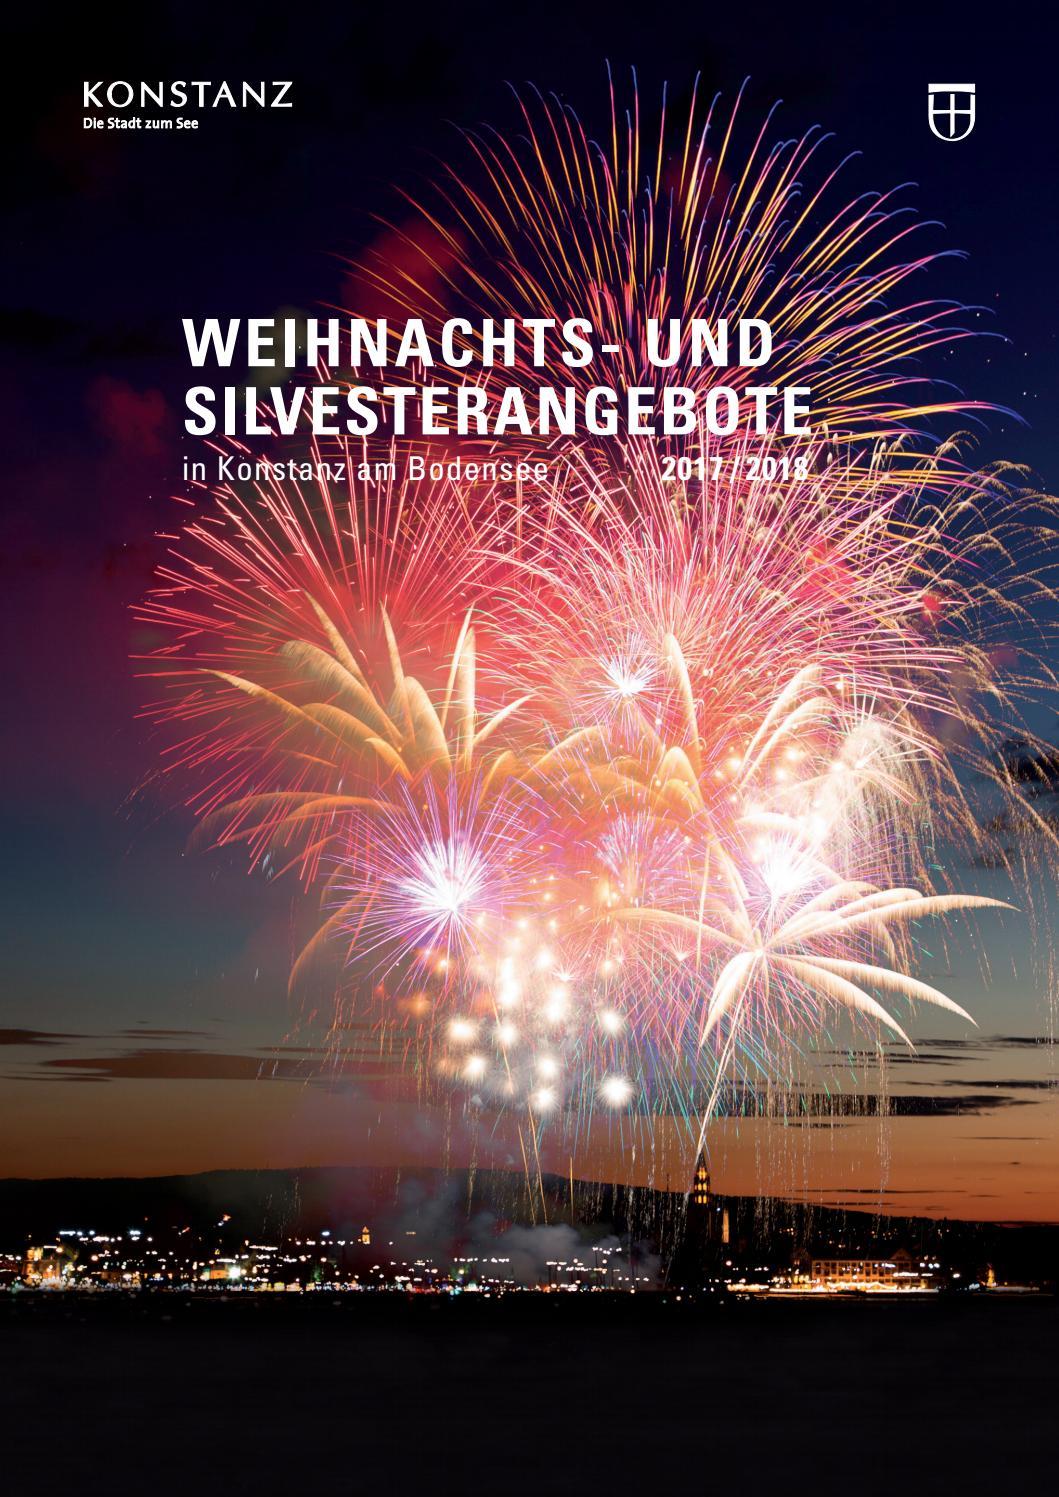 Silvesterangebote Bodensee